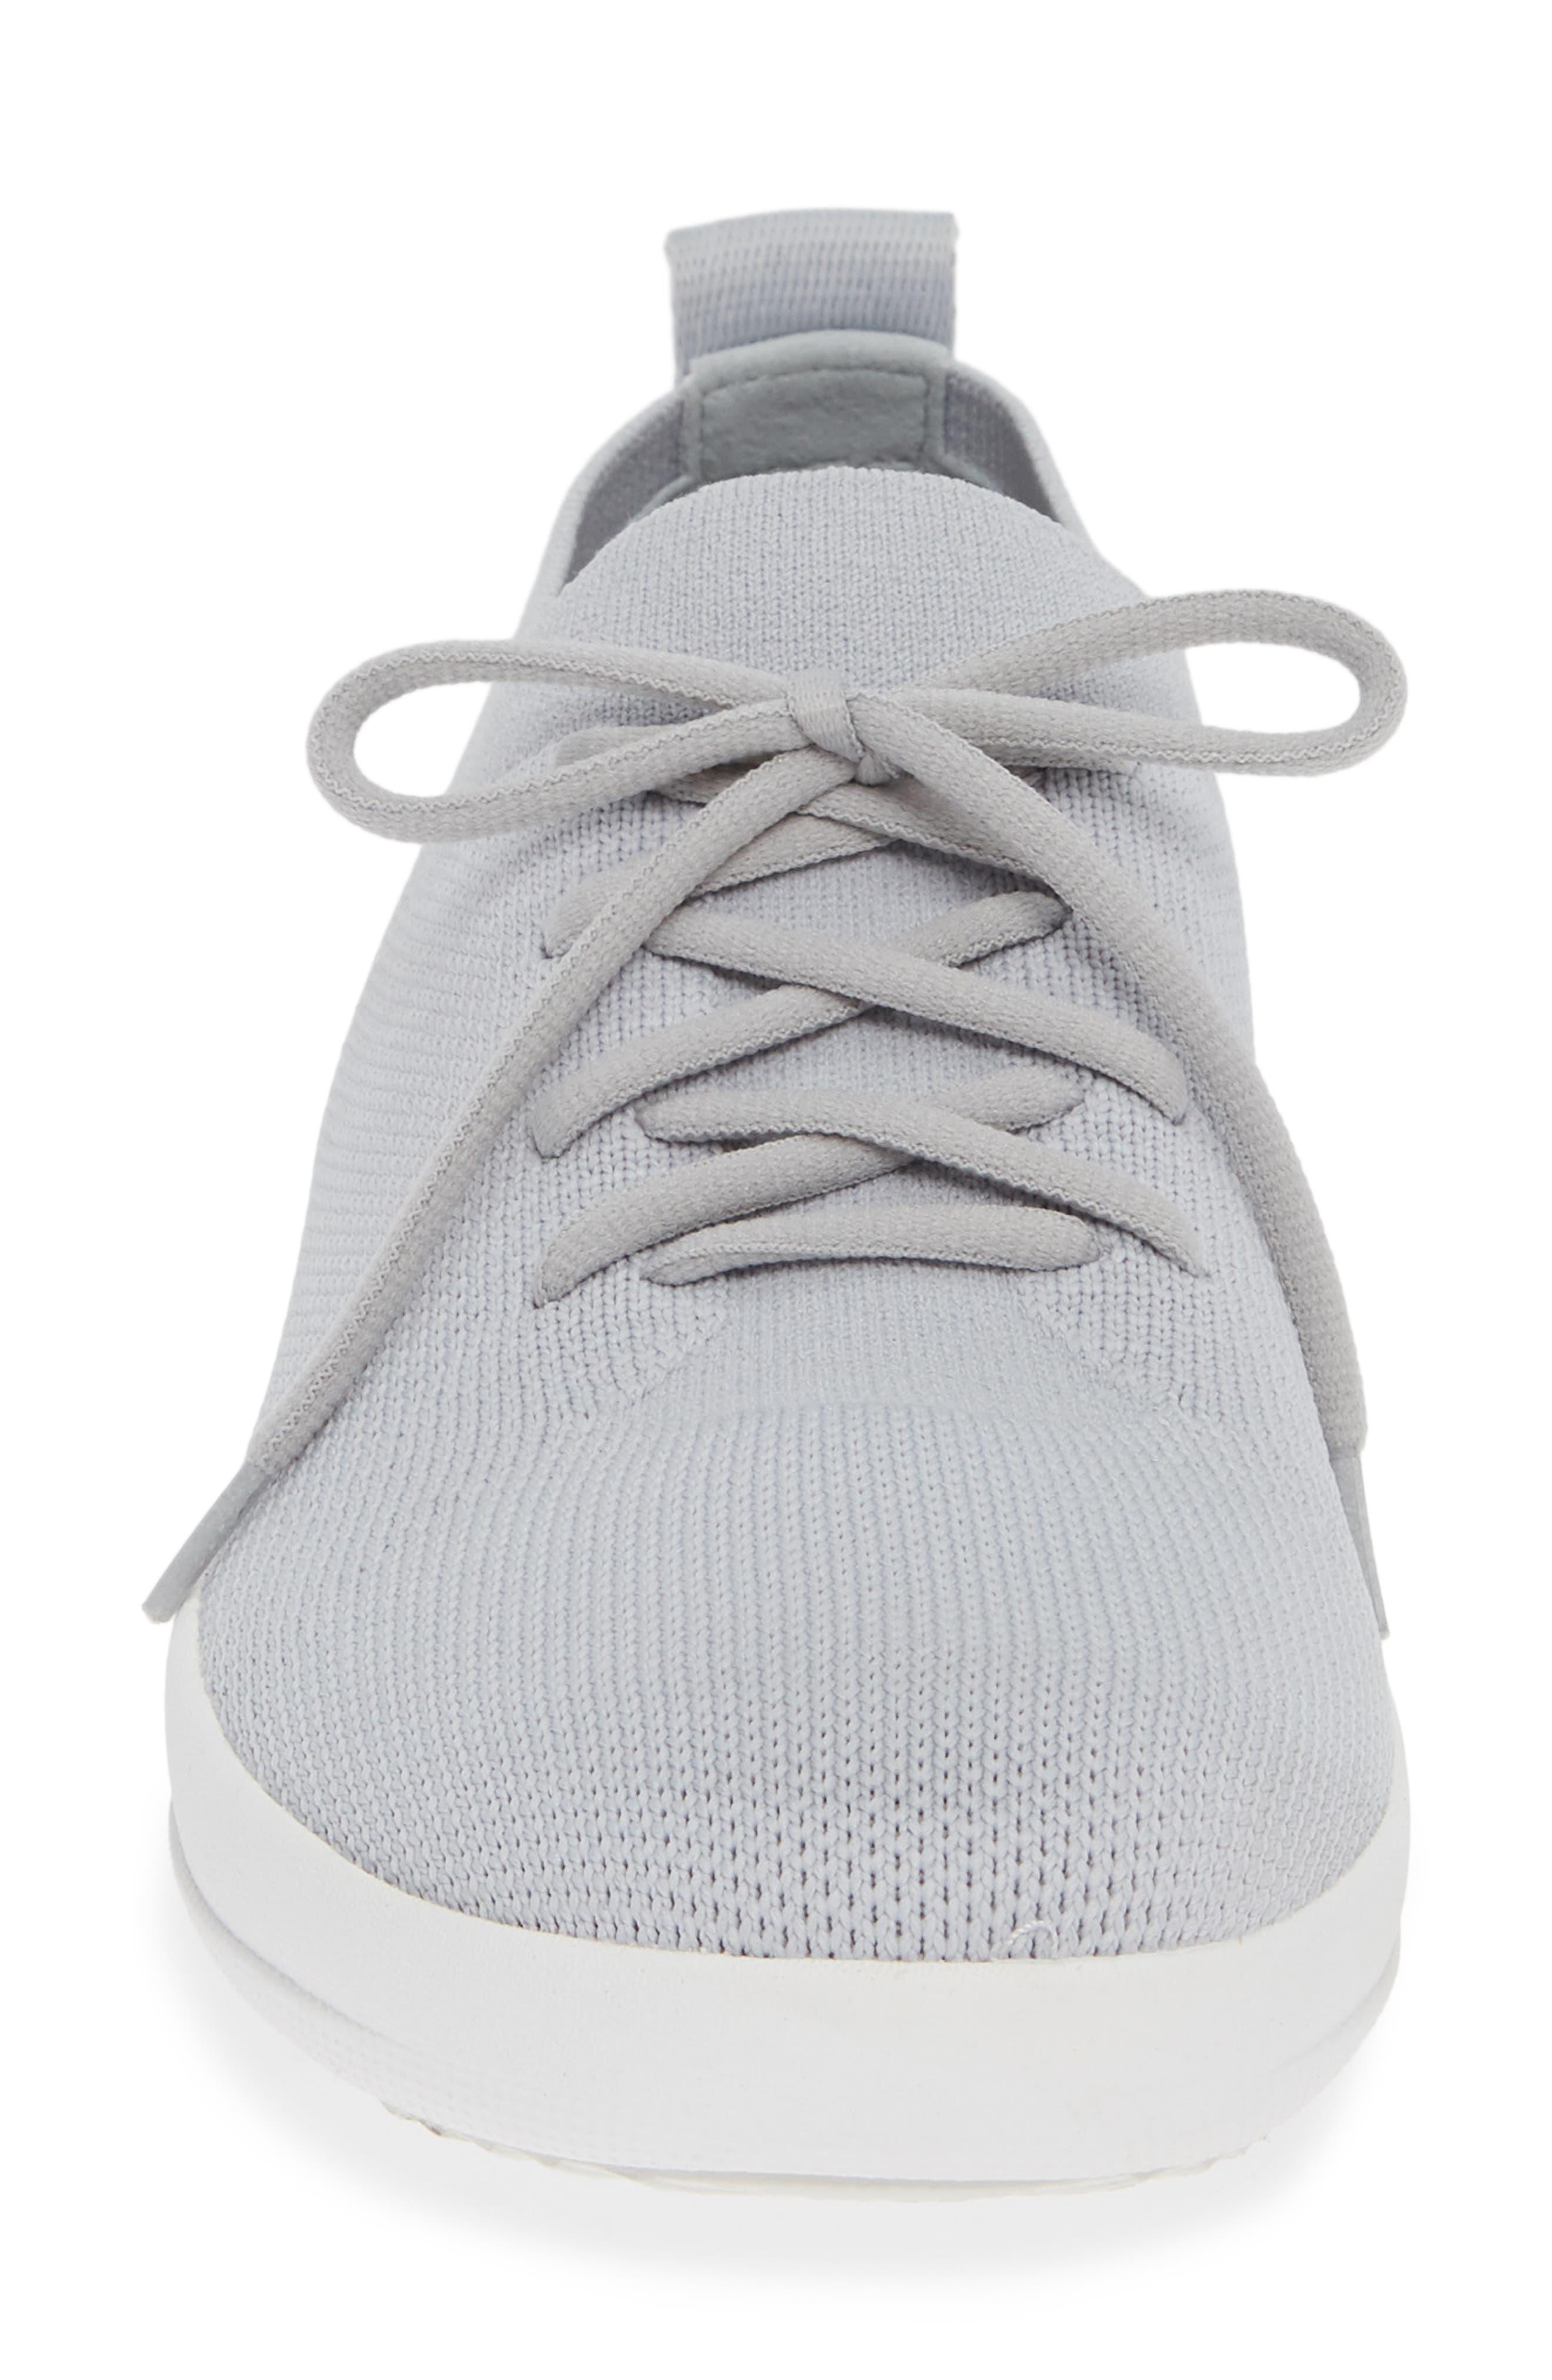 F-Sporty Uberknit<sup>™</sup> Sneaker,                             Alternate thumbnail 4, color,                             PEARL FABRIC